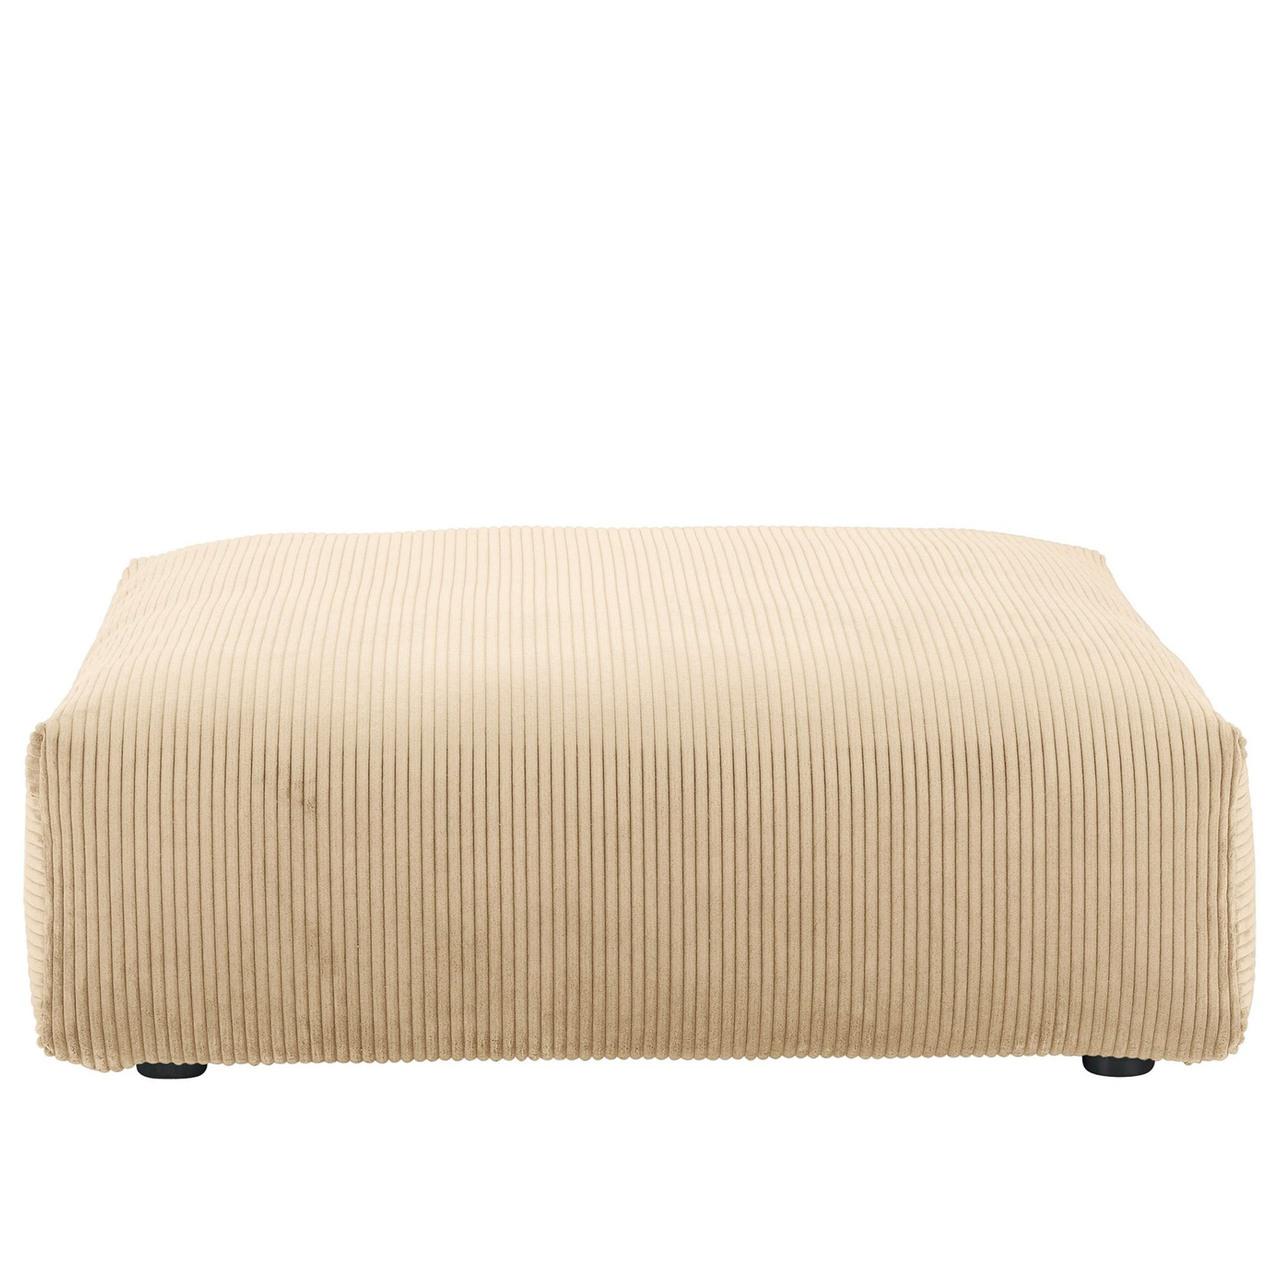 Vetsak Sofa Seat Large Cord Velour - Sand